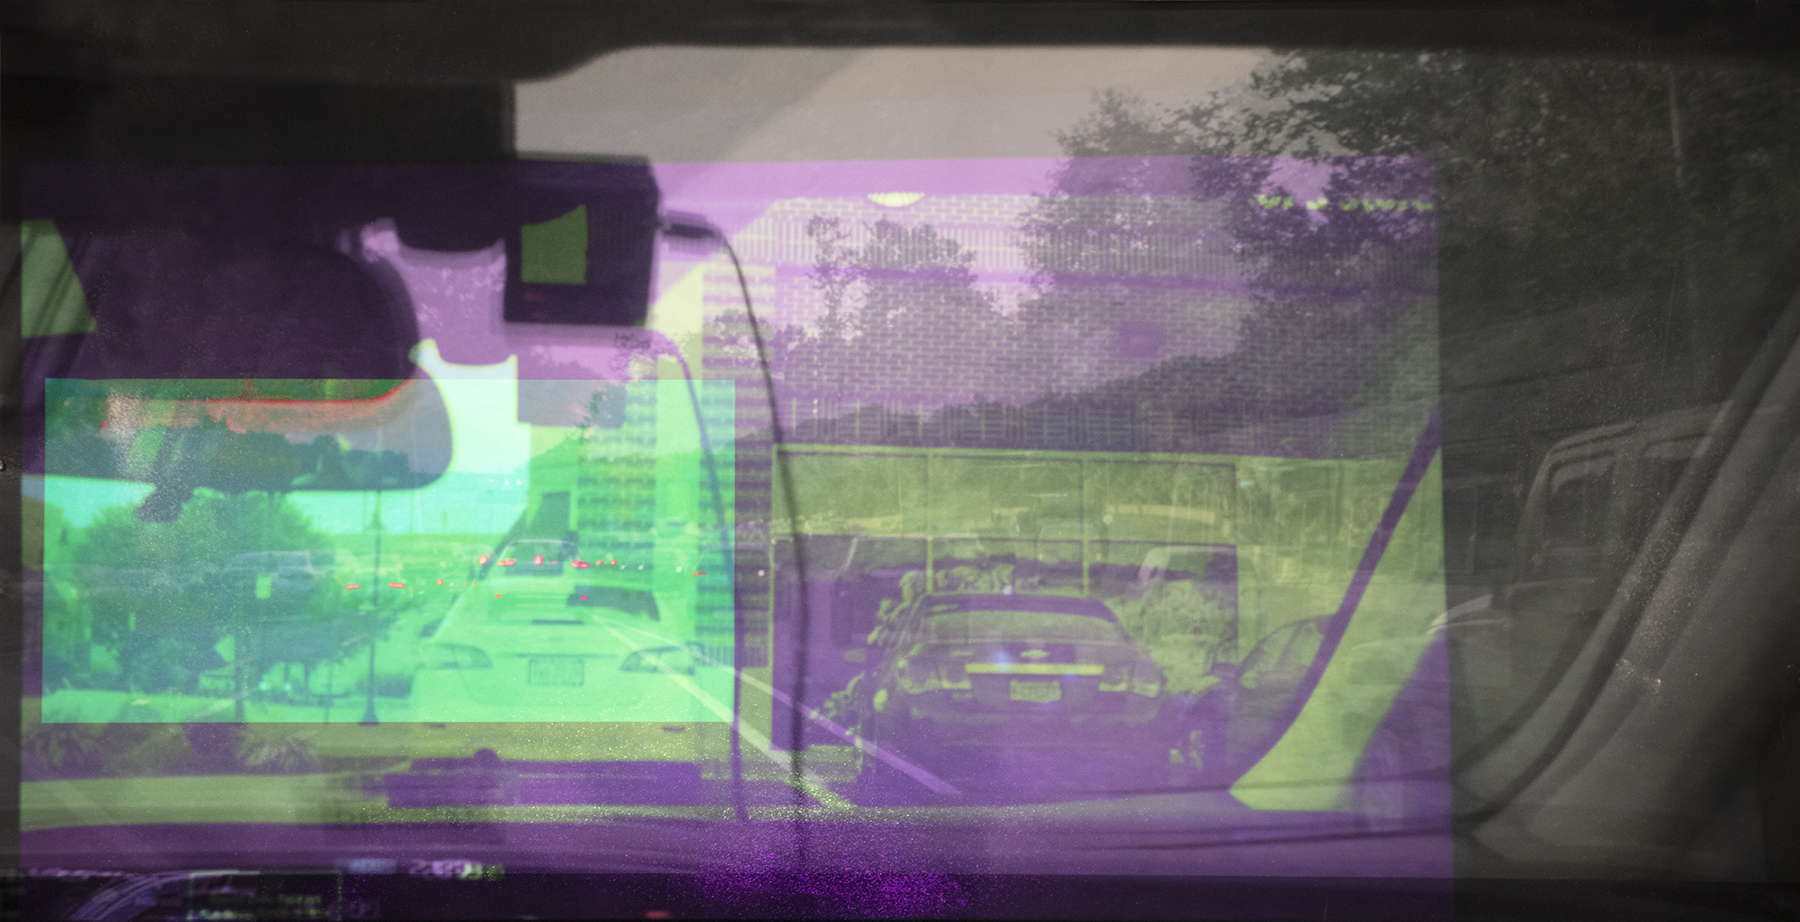 Memory Drive 2 - Video Projection on Archival InkJet Print